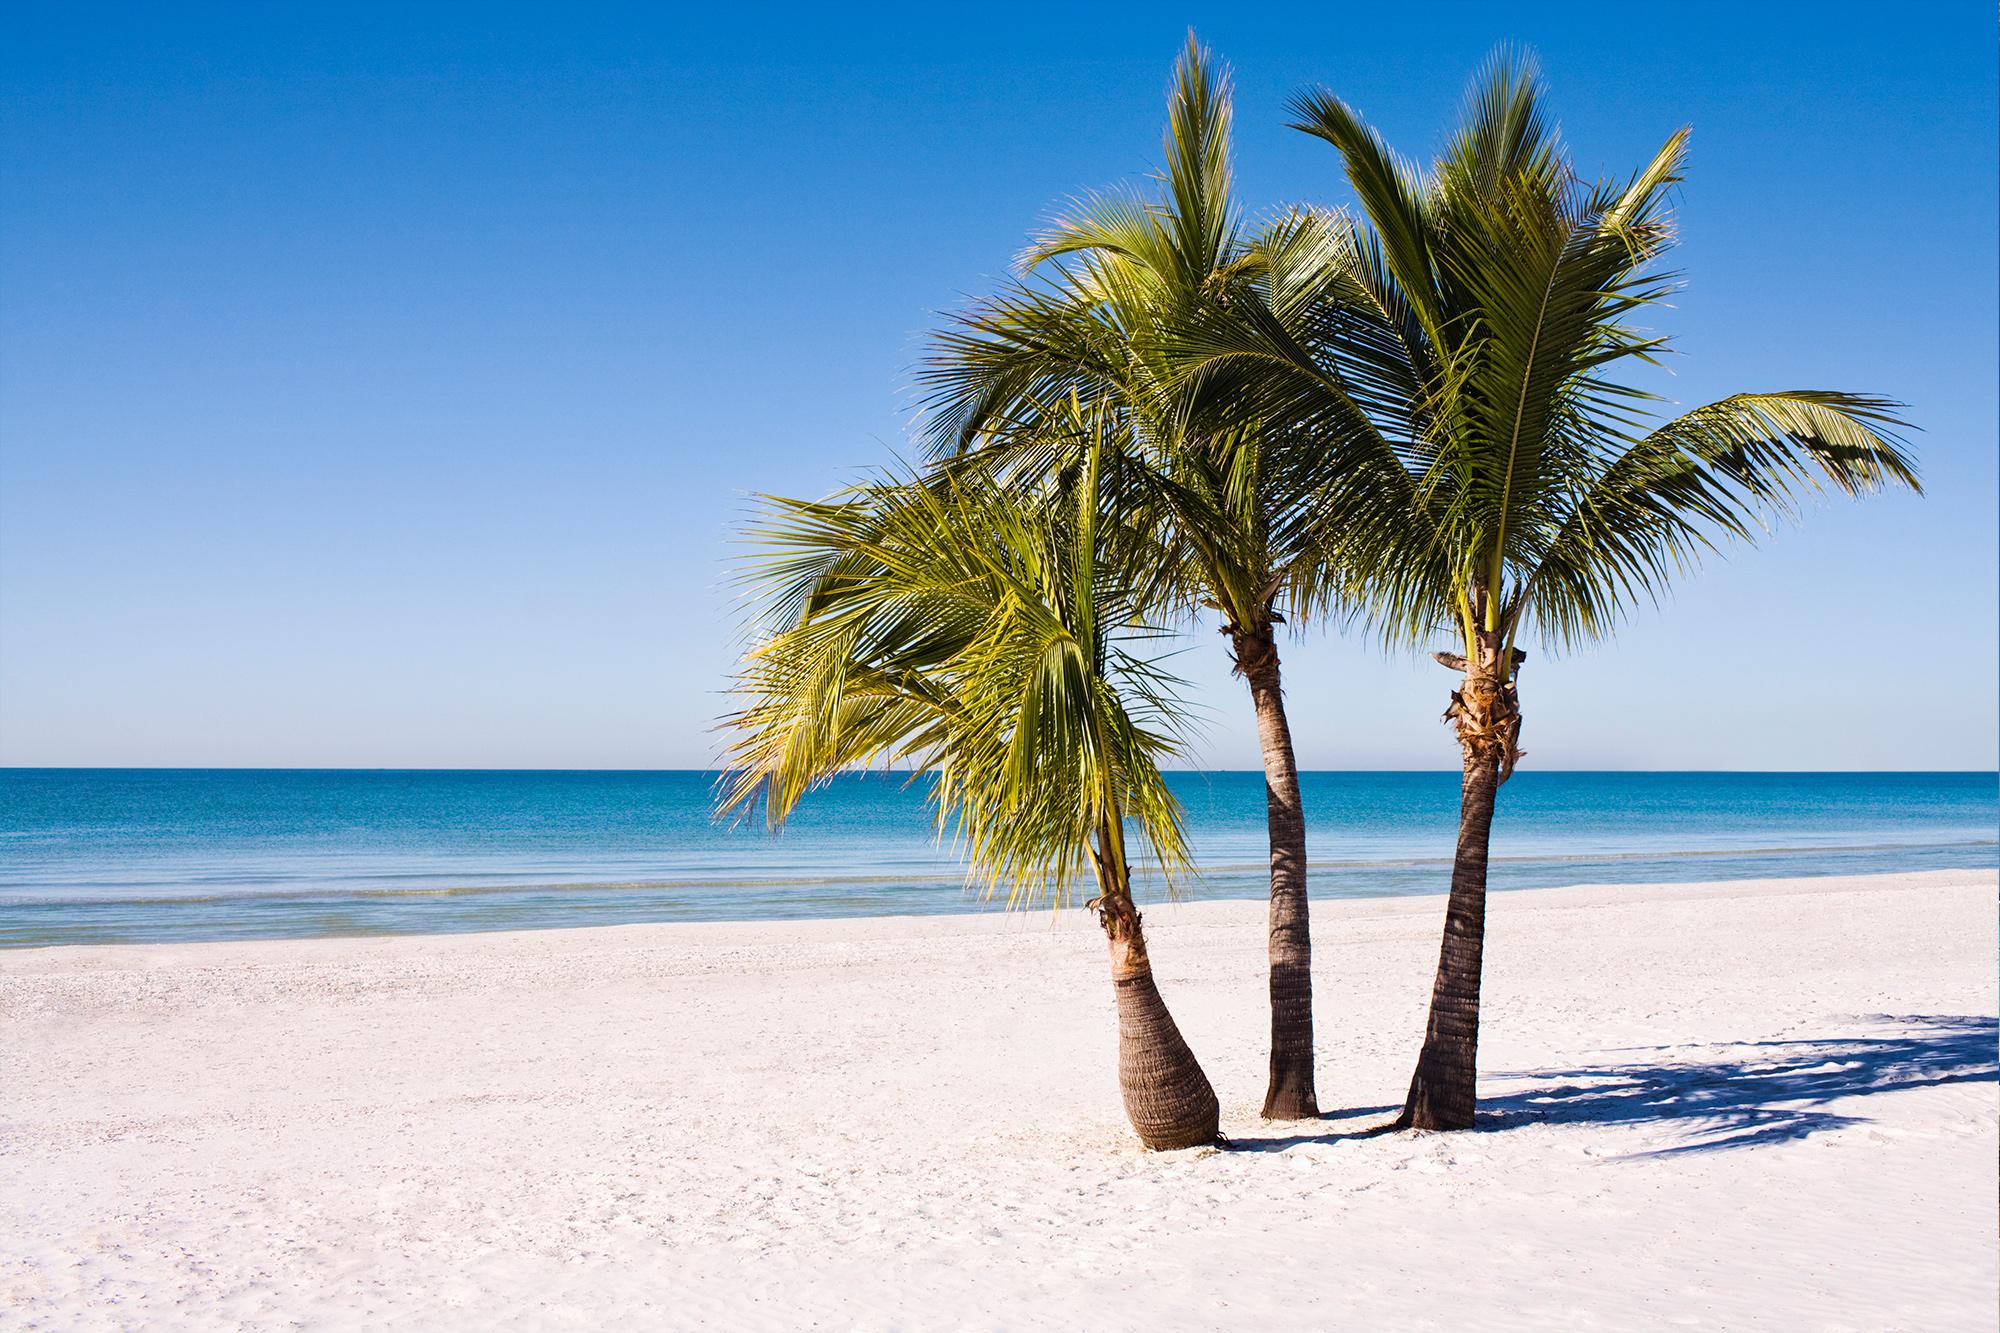 Tui Mallorca Reisen Urlaub Pauschalreisen Mit Tui